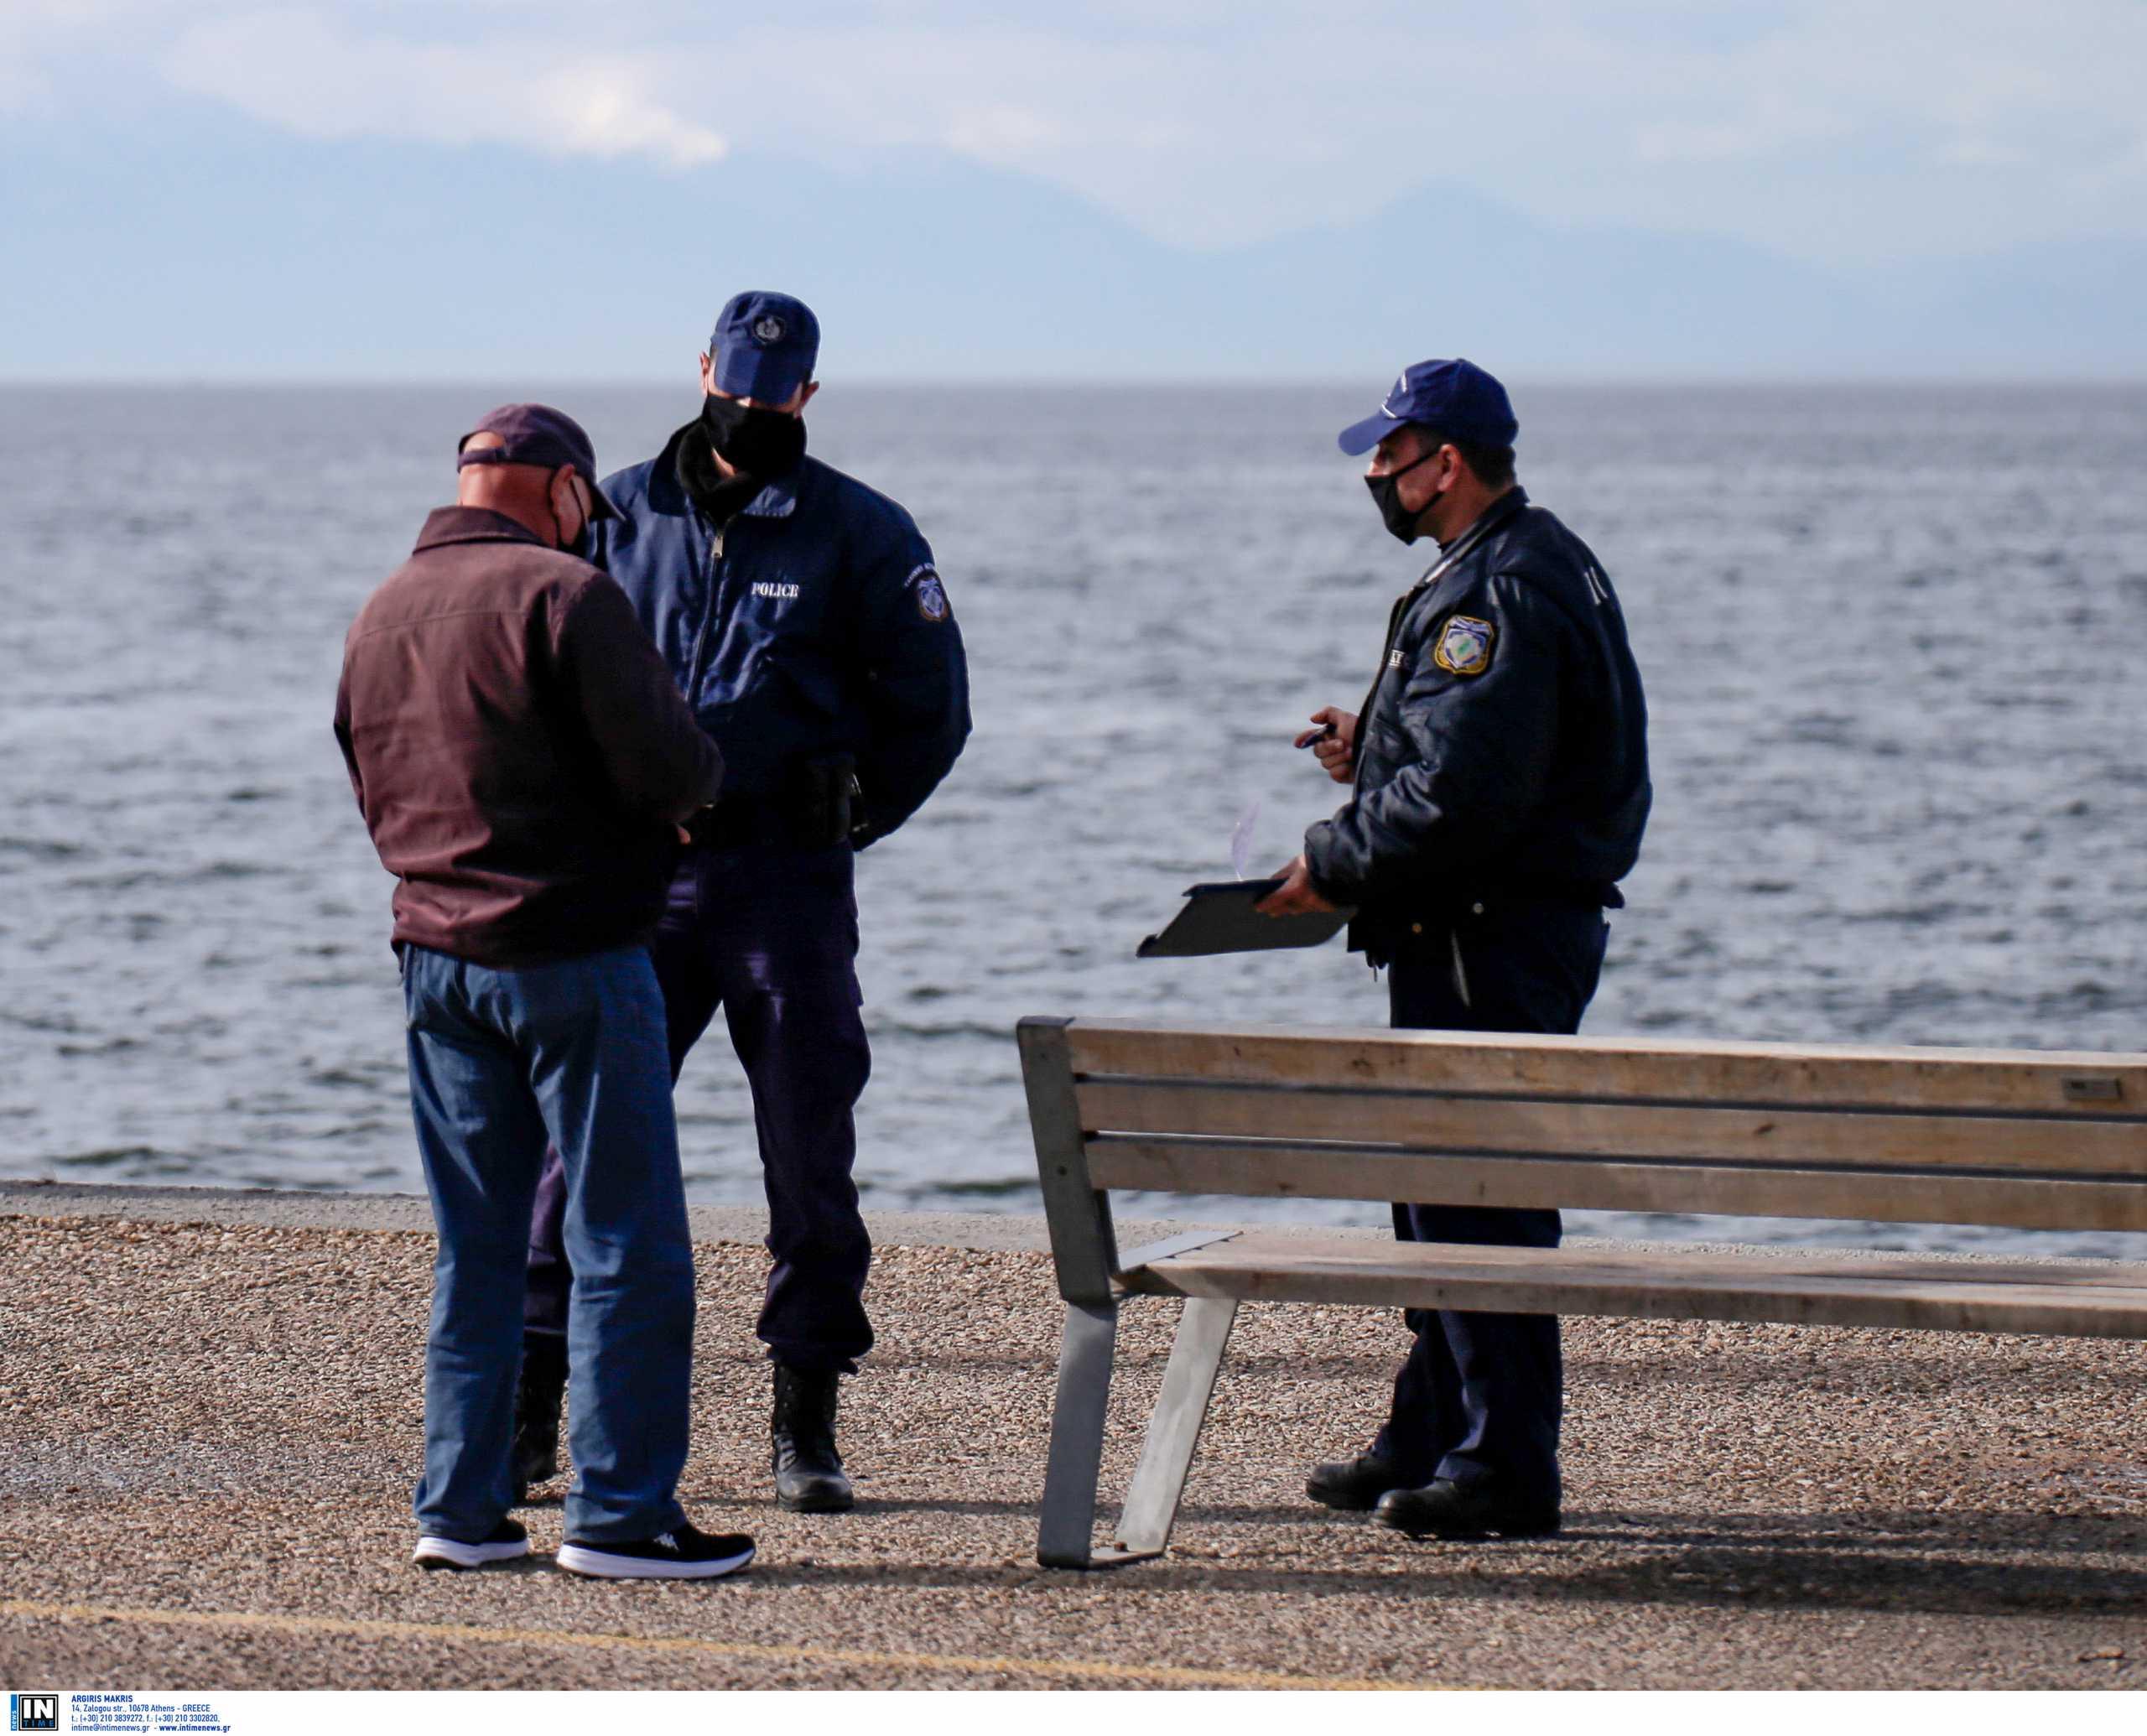 Lockdown: 16 συλλήψεις και πρόστιμα 424.000 ευρώ στους παραβάτες